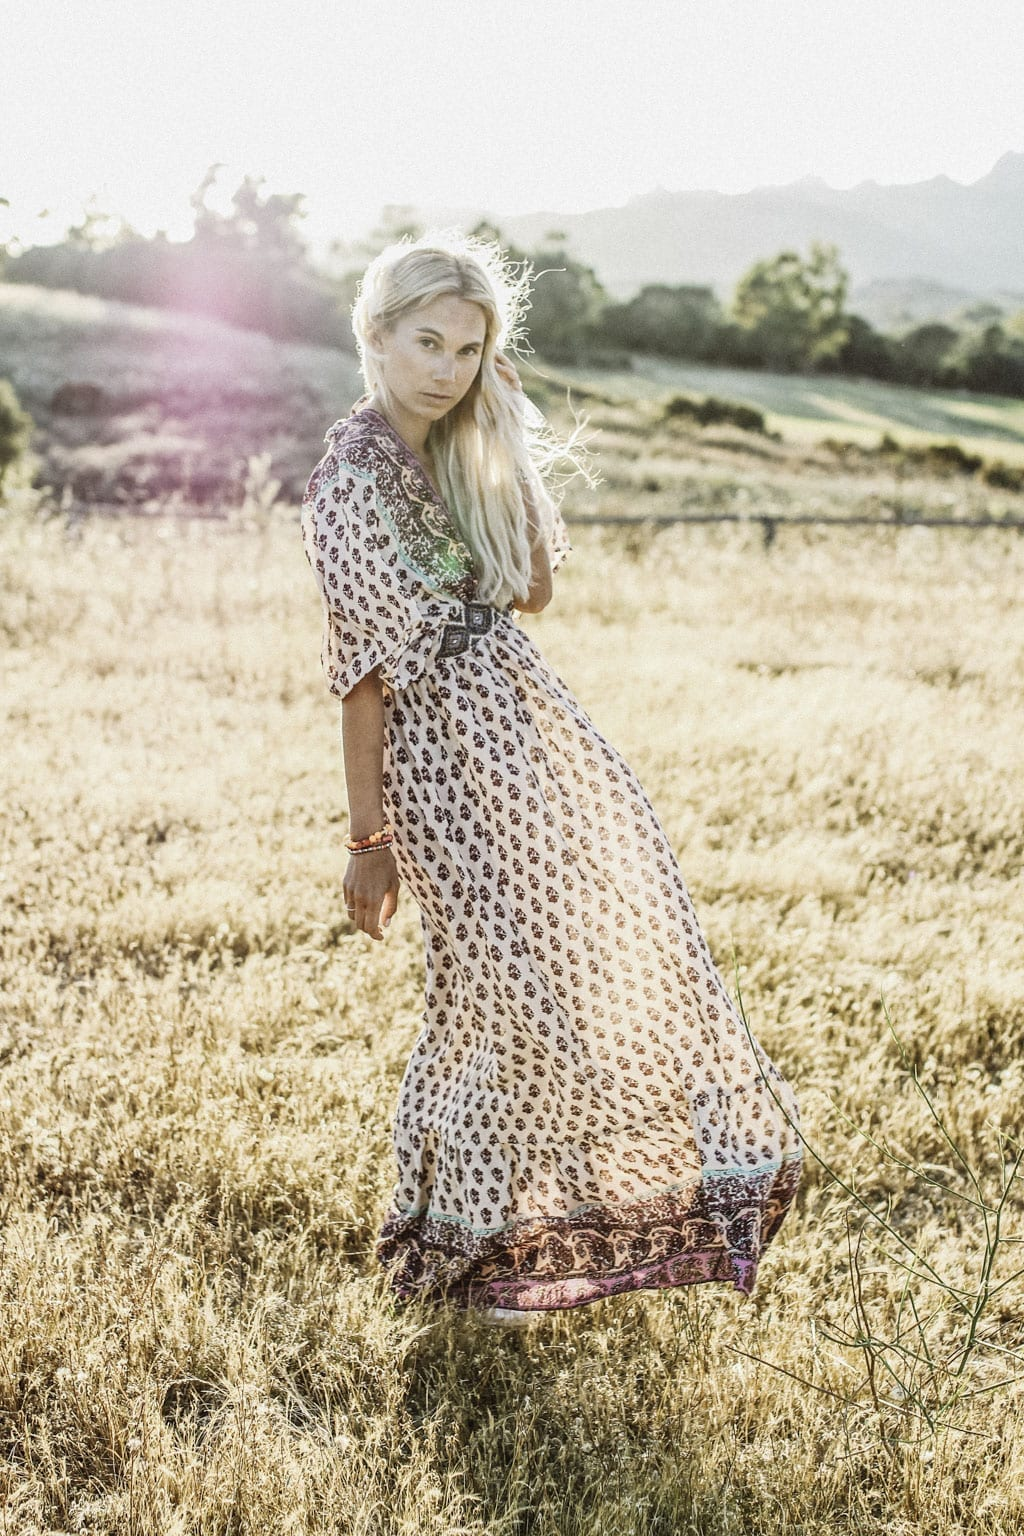 CK-1606_Sardinien-Sardegna-Sardinia-Italy-Italia-Fashion-Blog-Sun-Down-Dress-Blonde-Karin-Kaswurm-9815